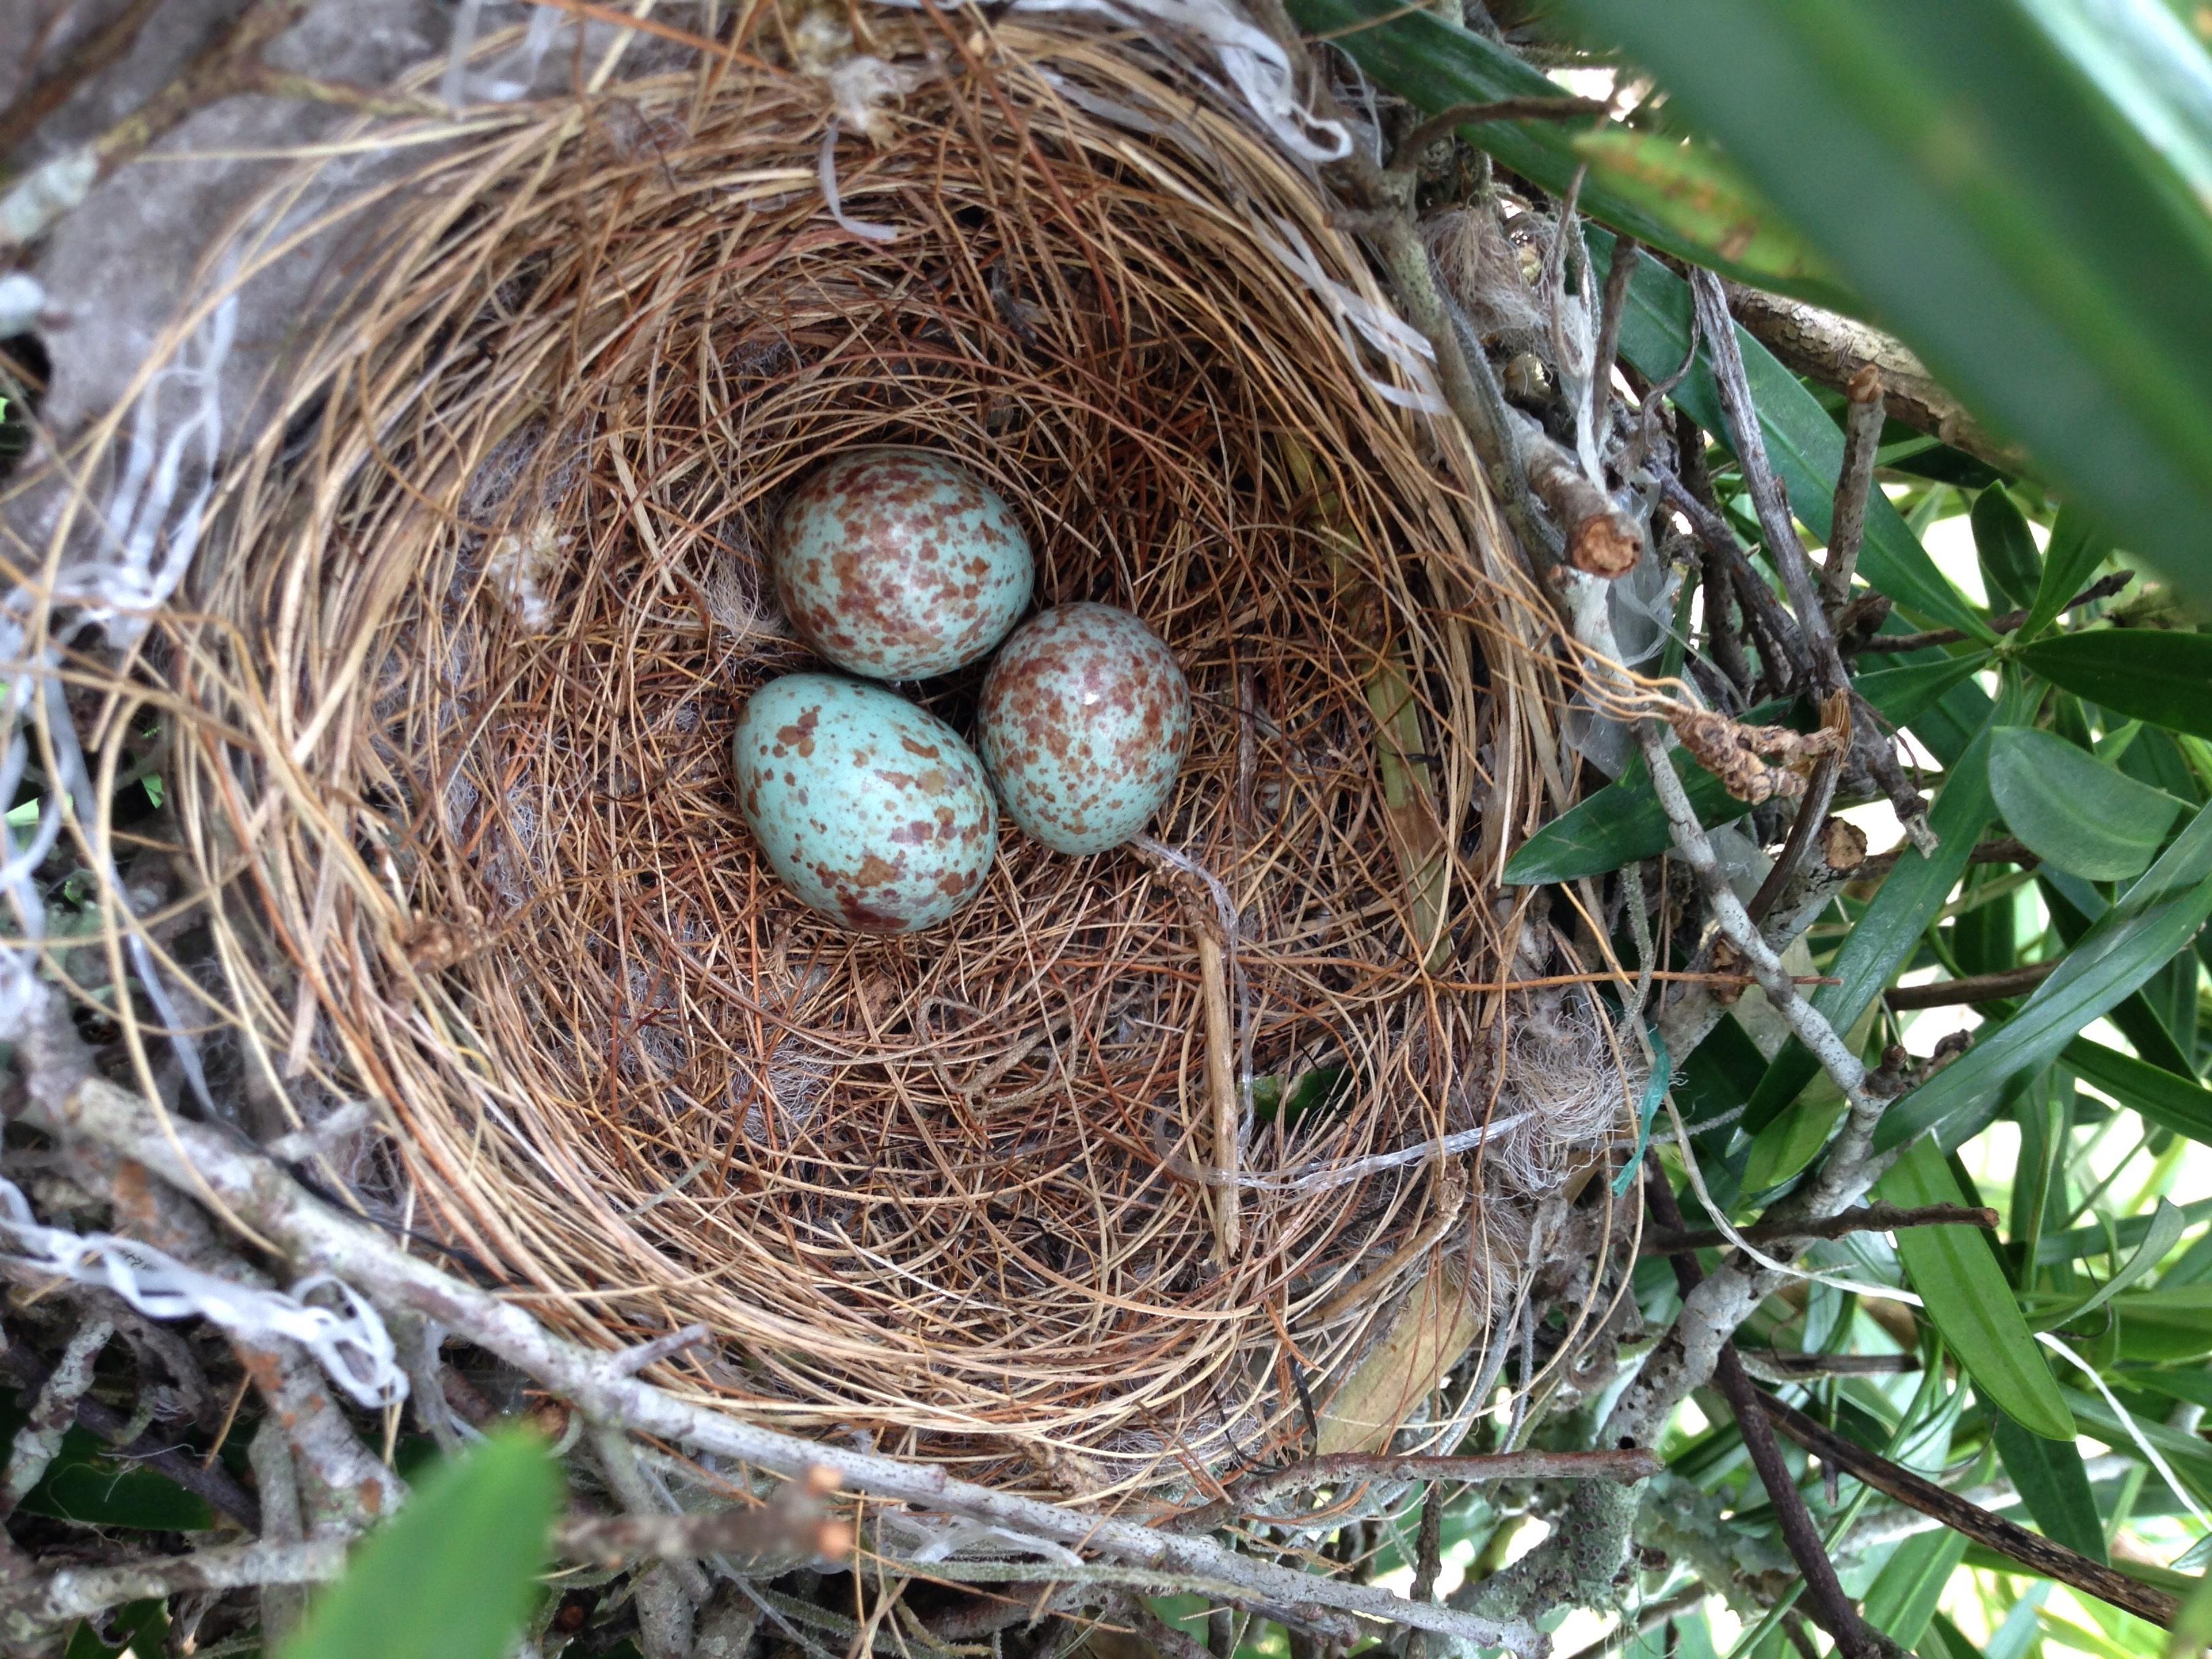 гнездо птиц фото можно увидеть